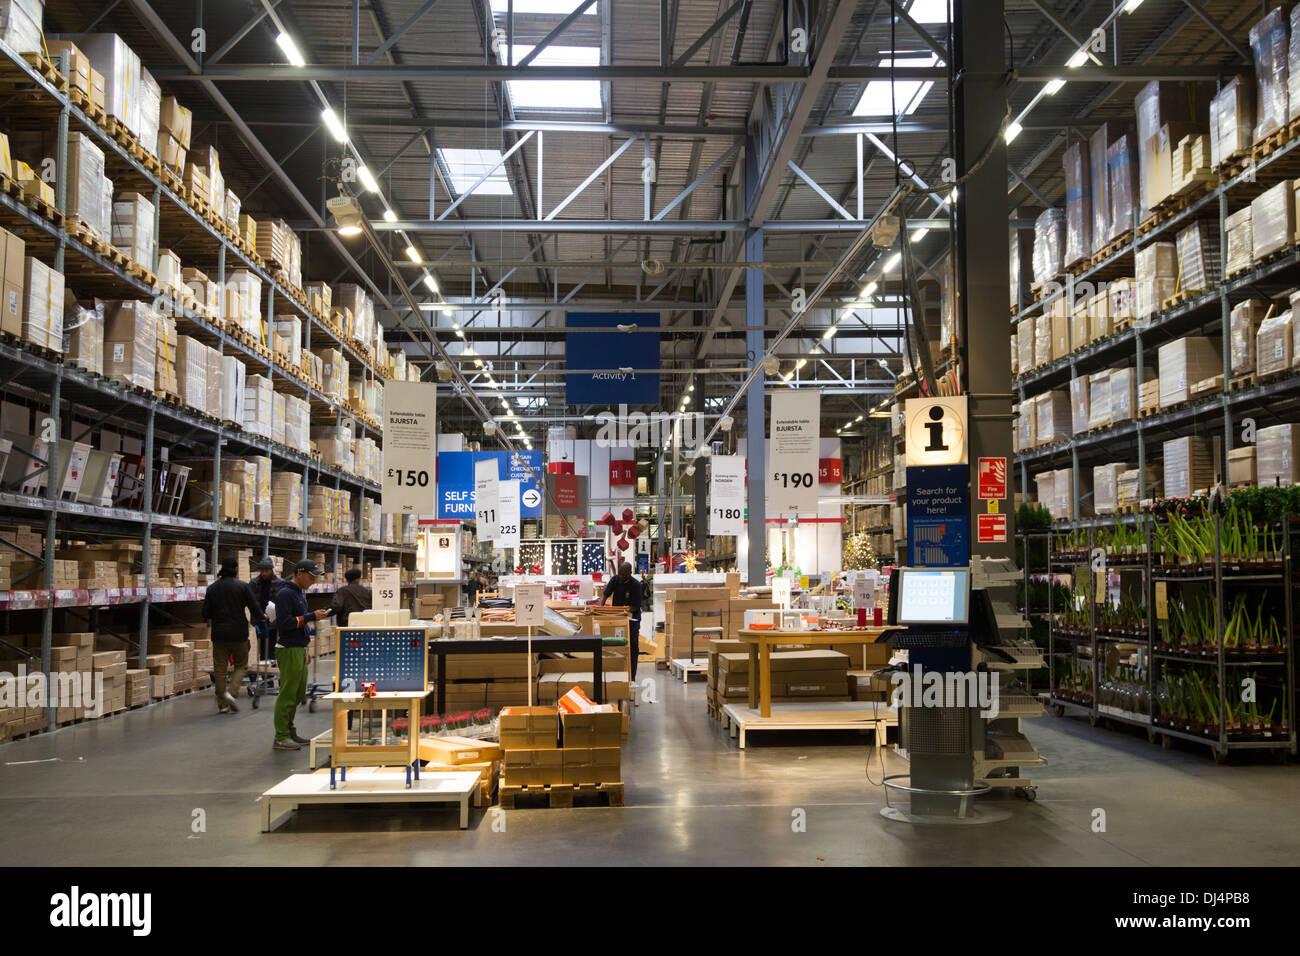 Collection Ikea Self-Service Isles - Edmonton - Londres Photo Stock